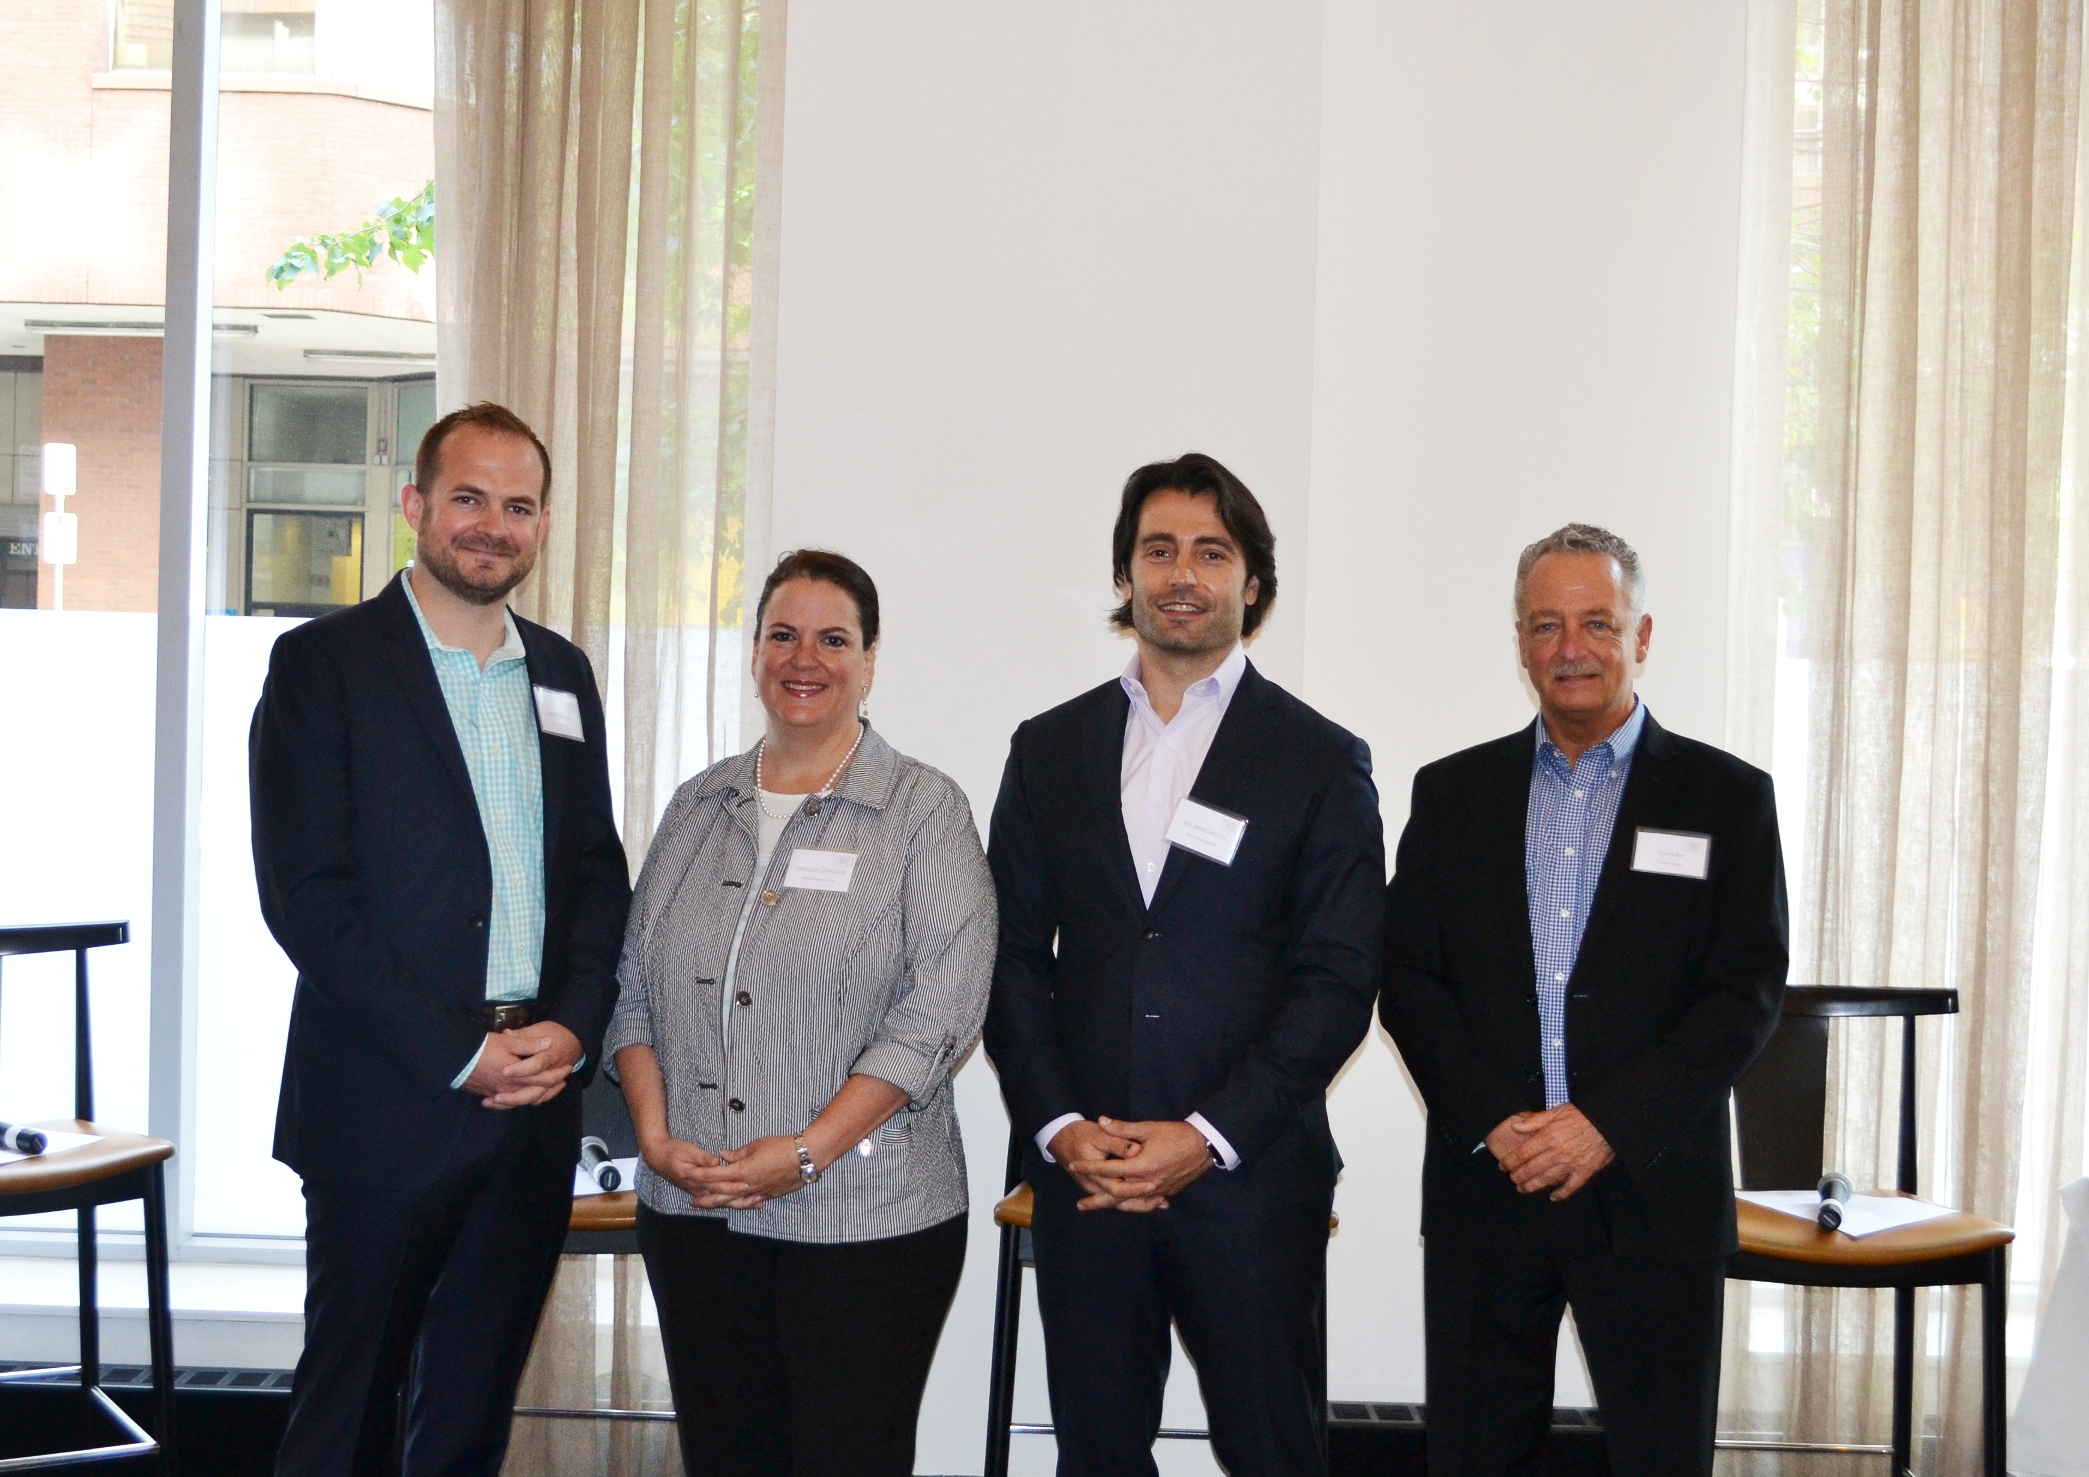 panelists-smaller.jpg